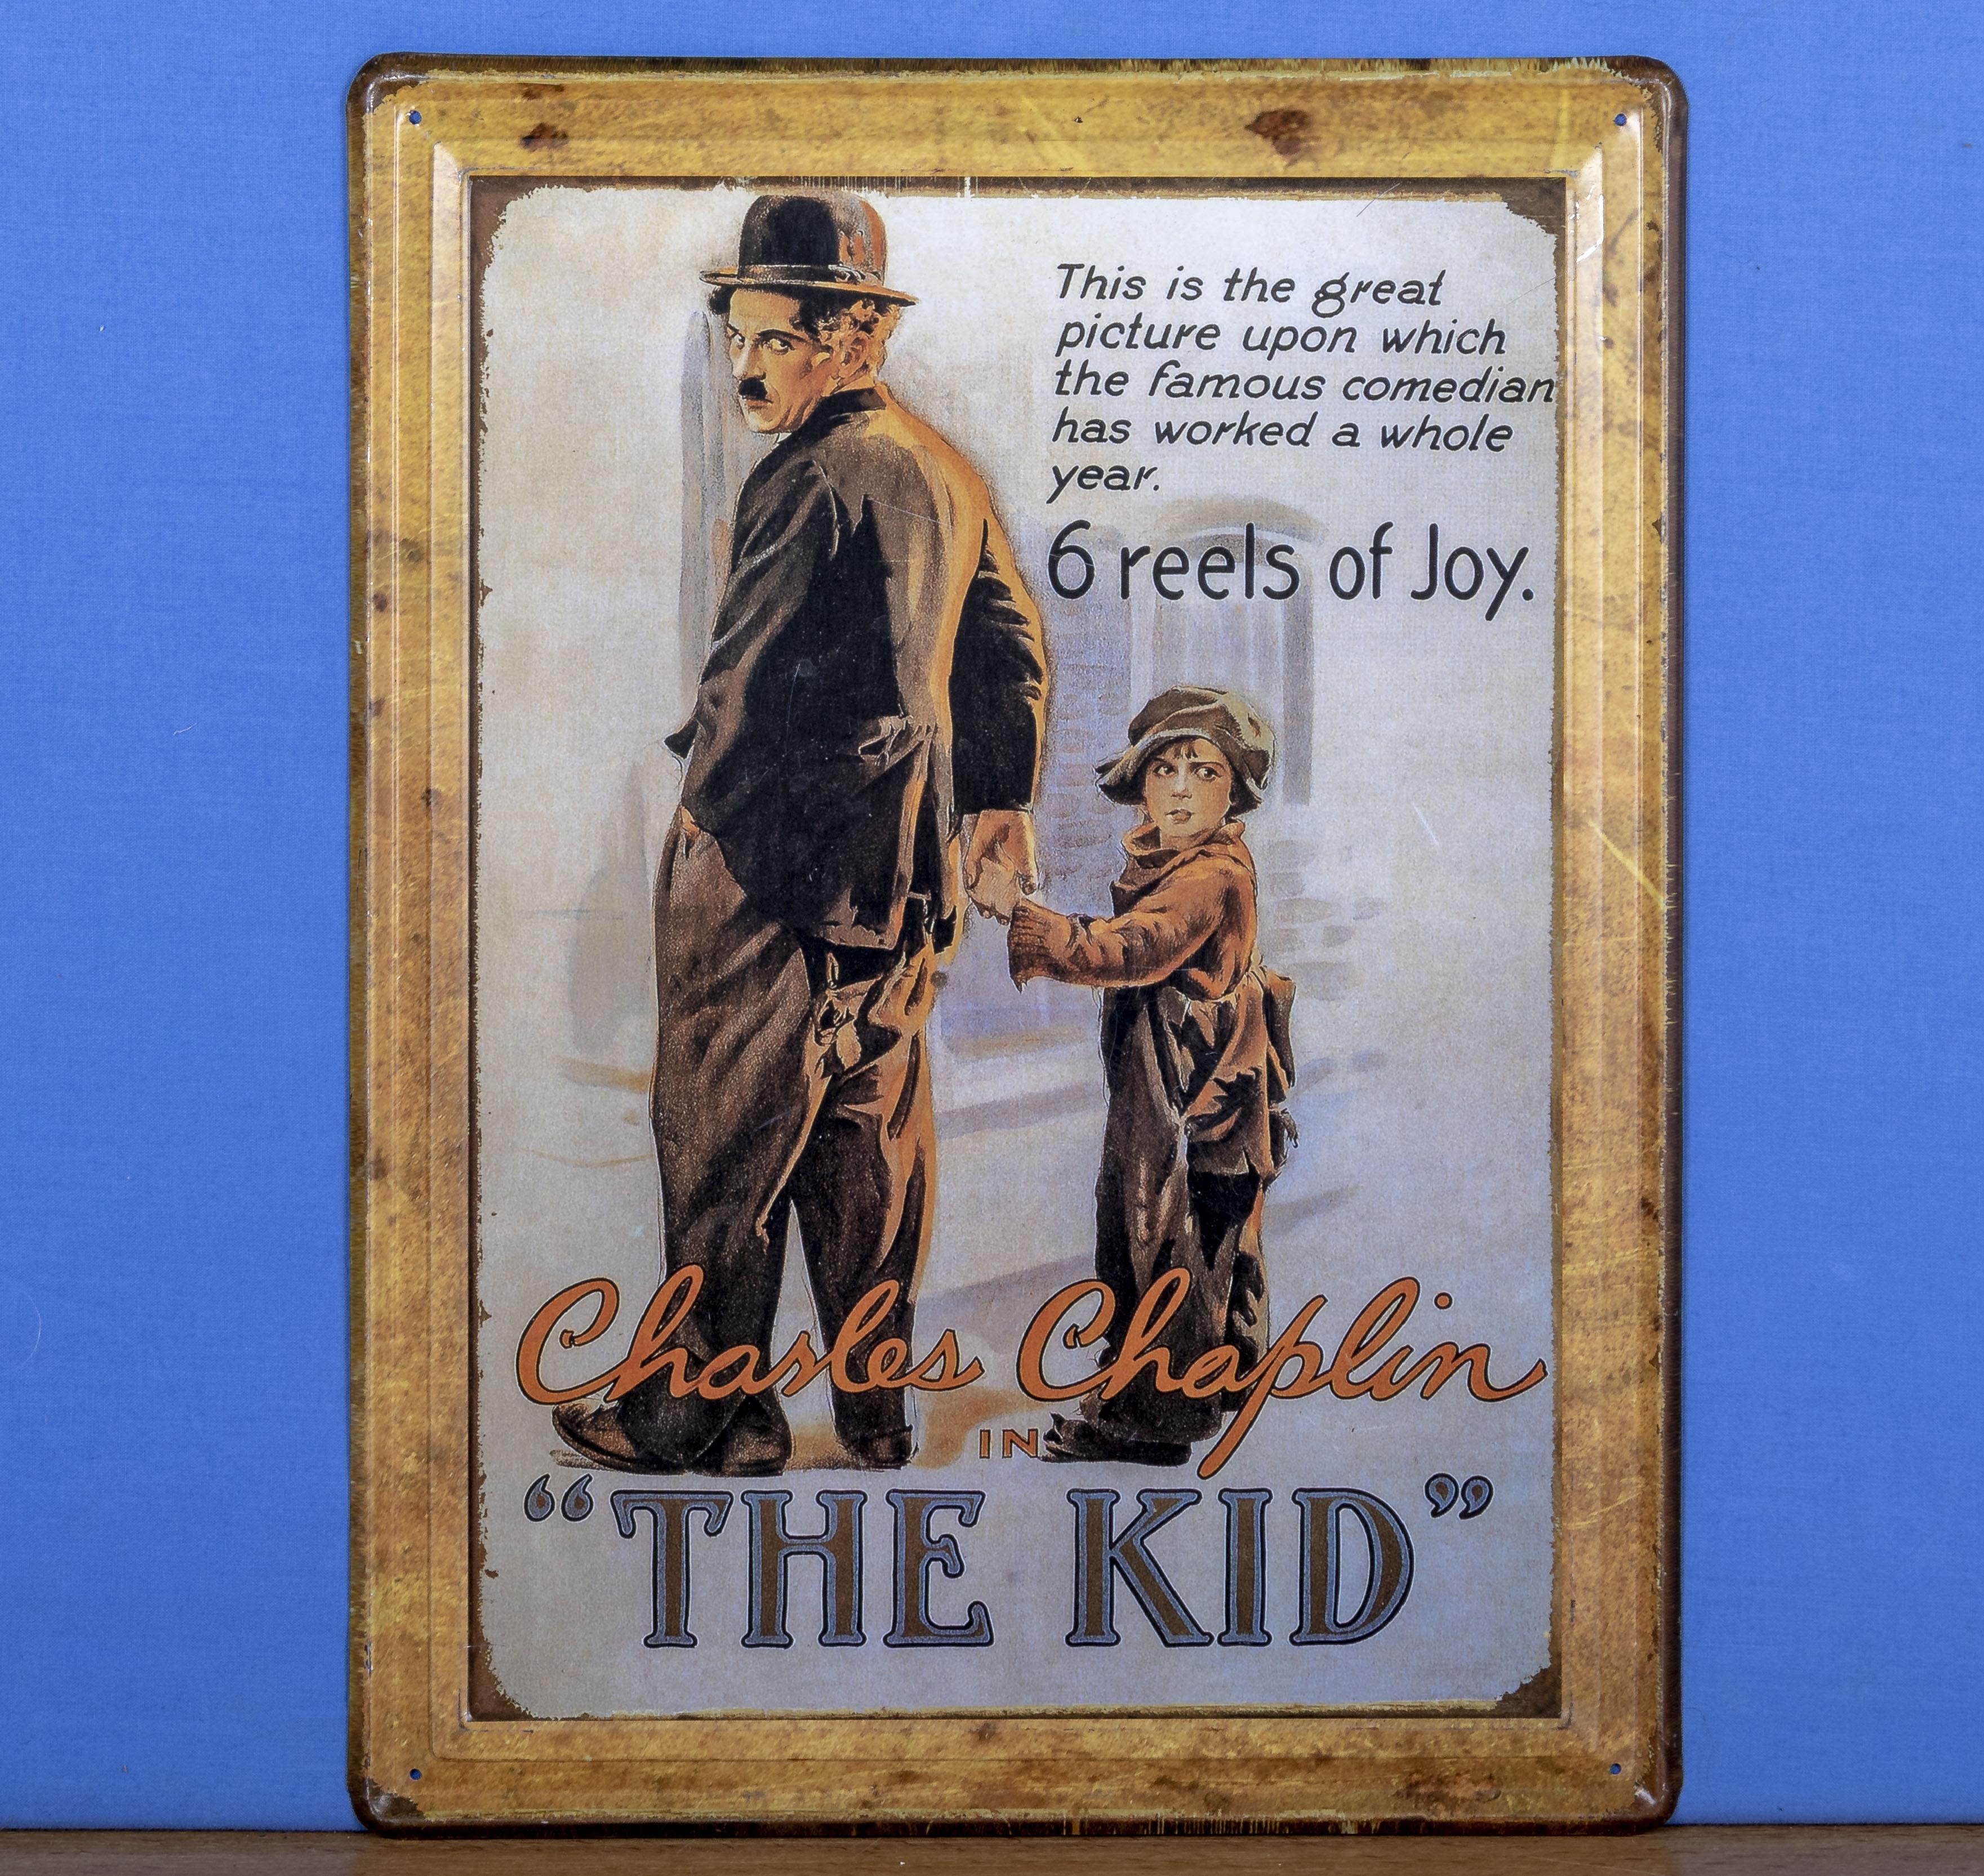 A tin advertising sign Charles Chaplin The Kid